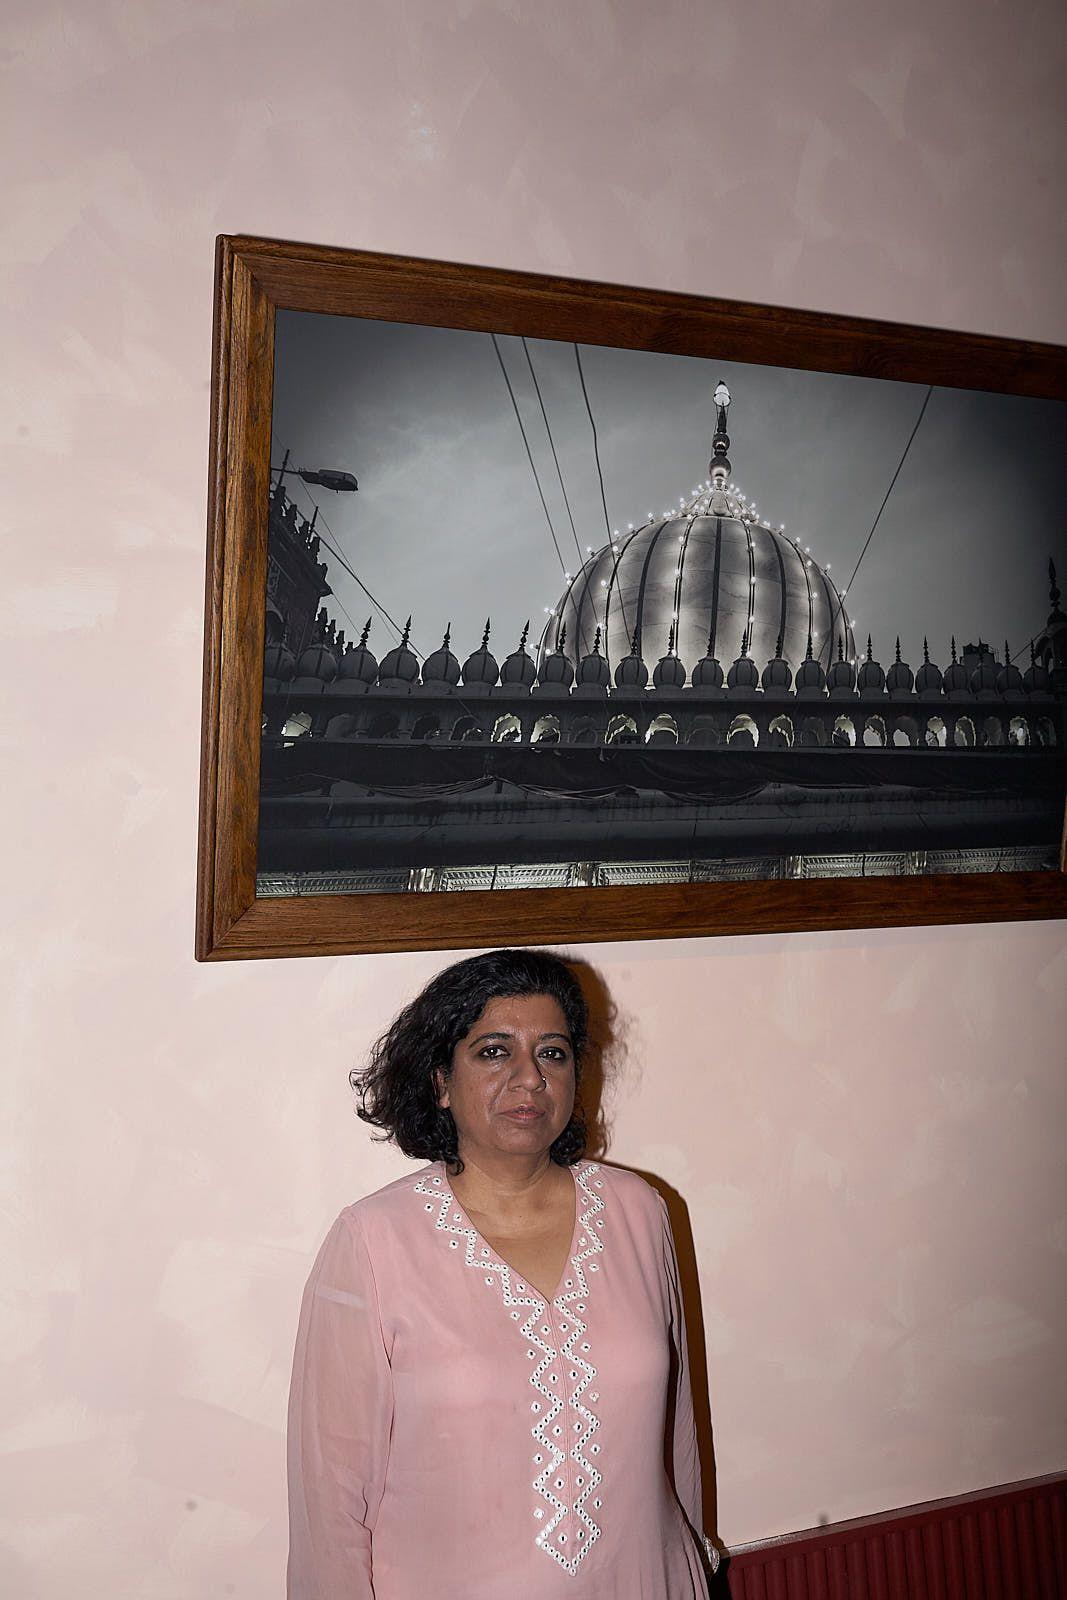 Asma Khan, at her new restaurant Darjeeling Express in central London last month